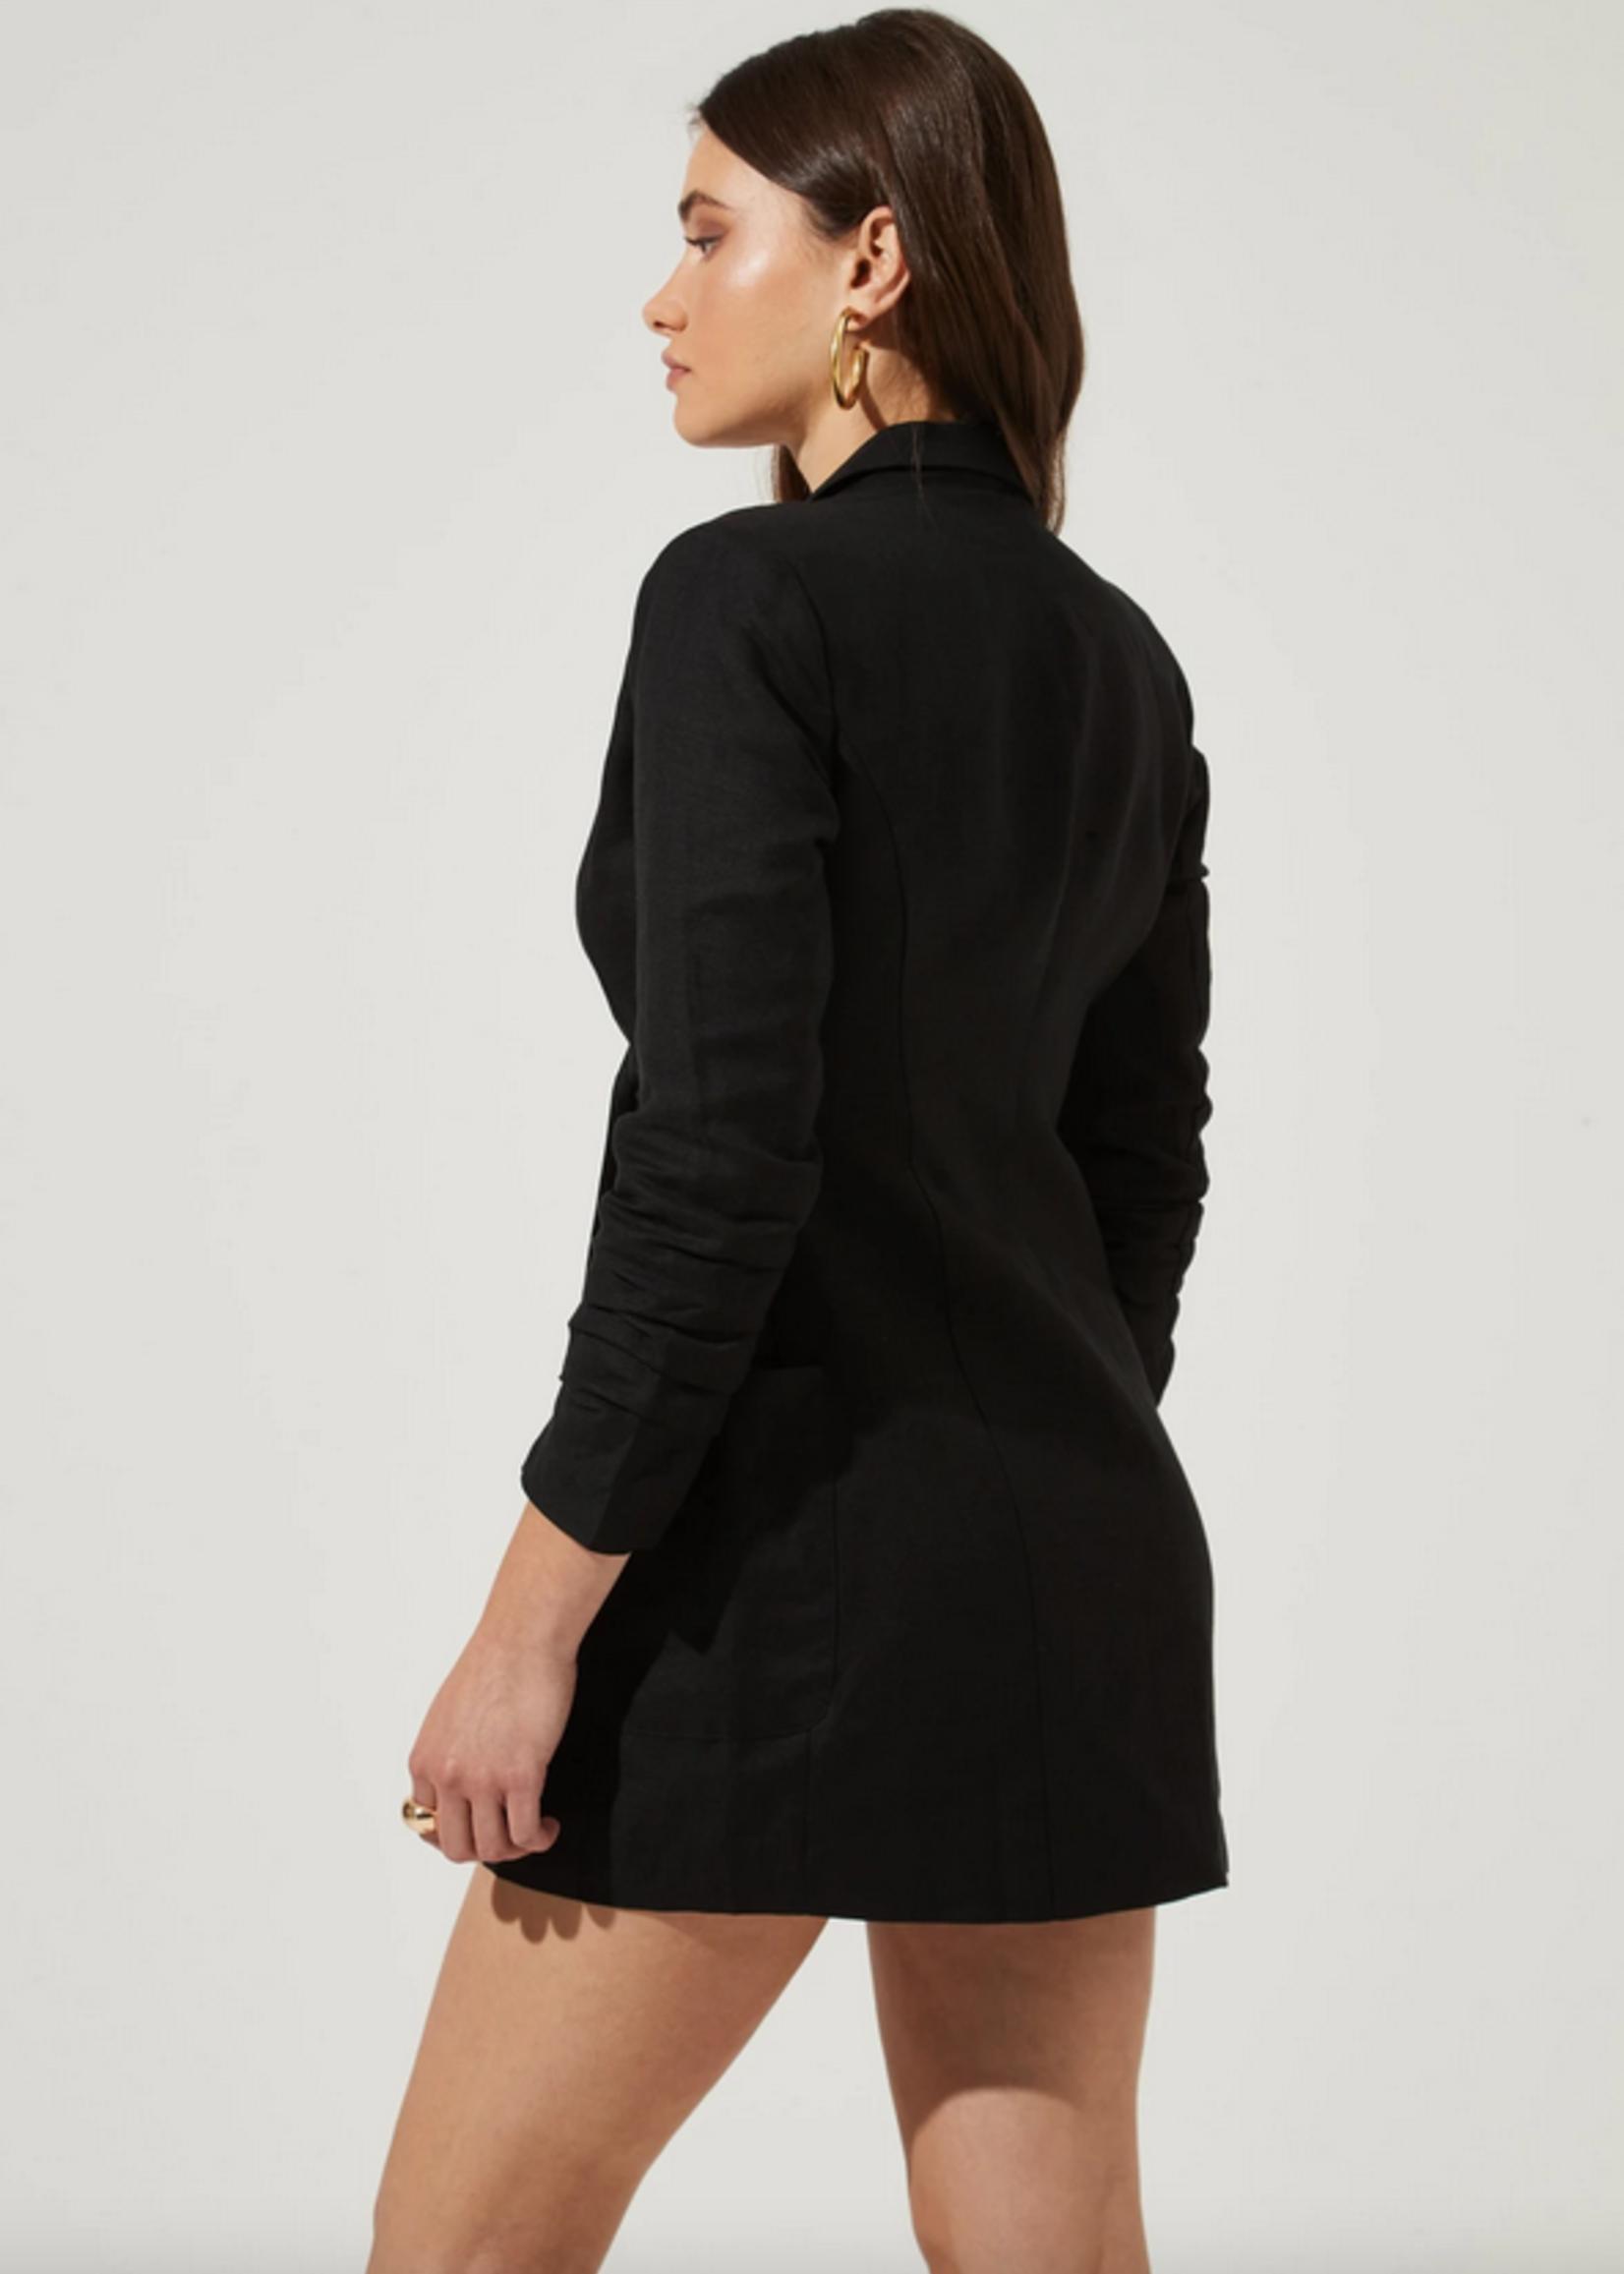 Elitaire Boutique Olivia Blazer Dress